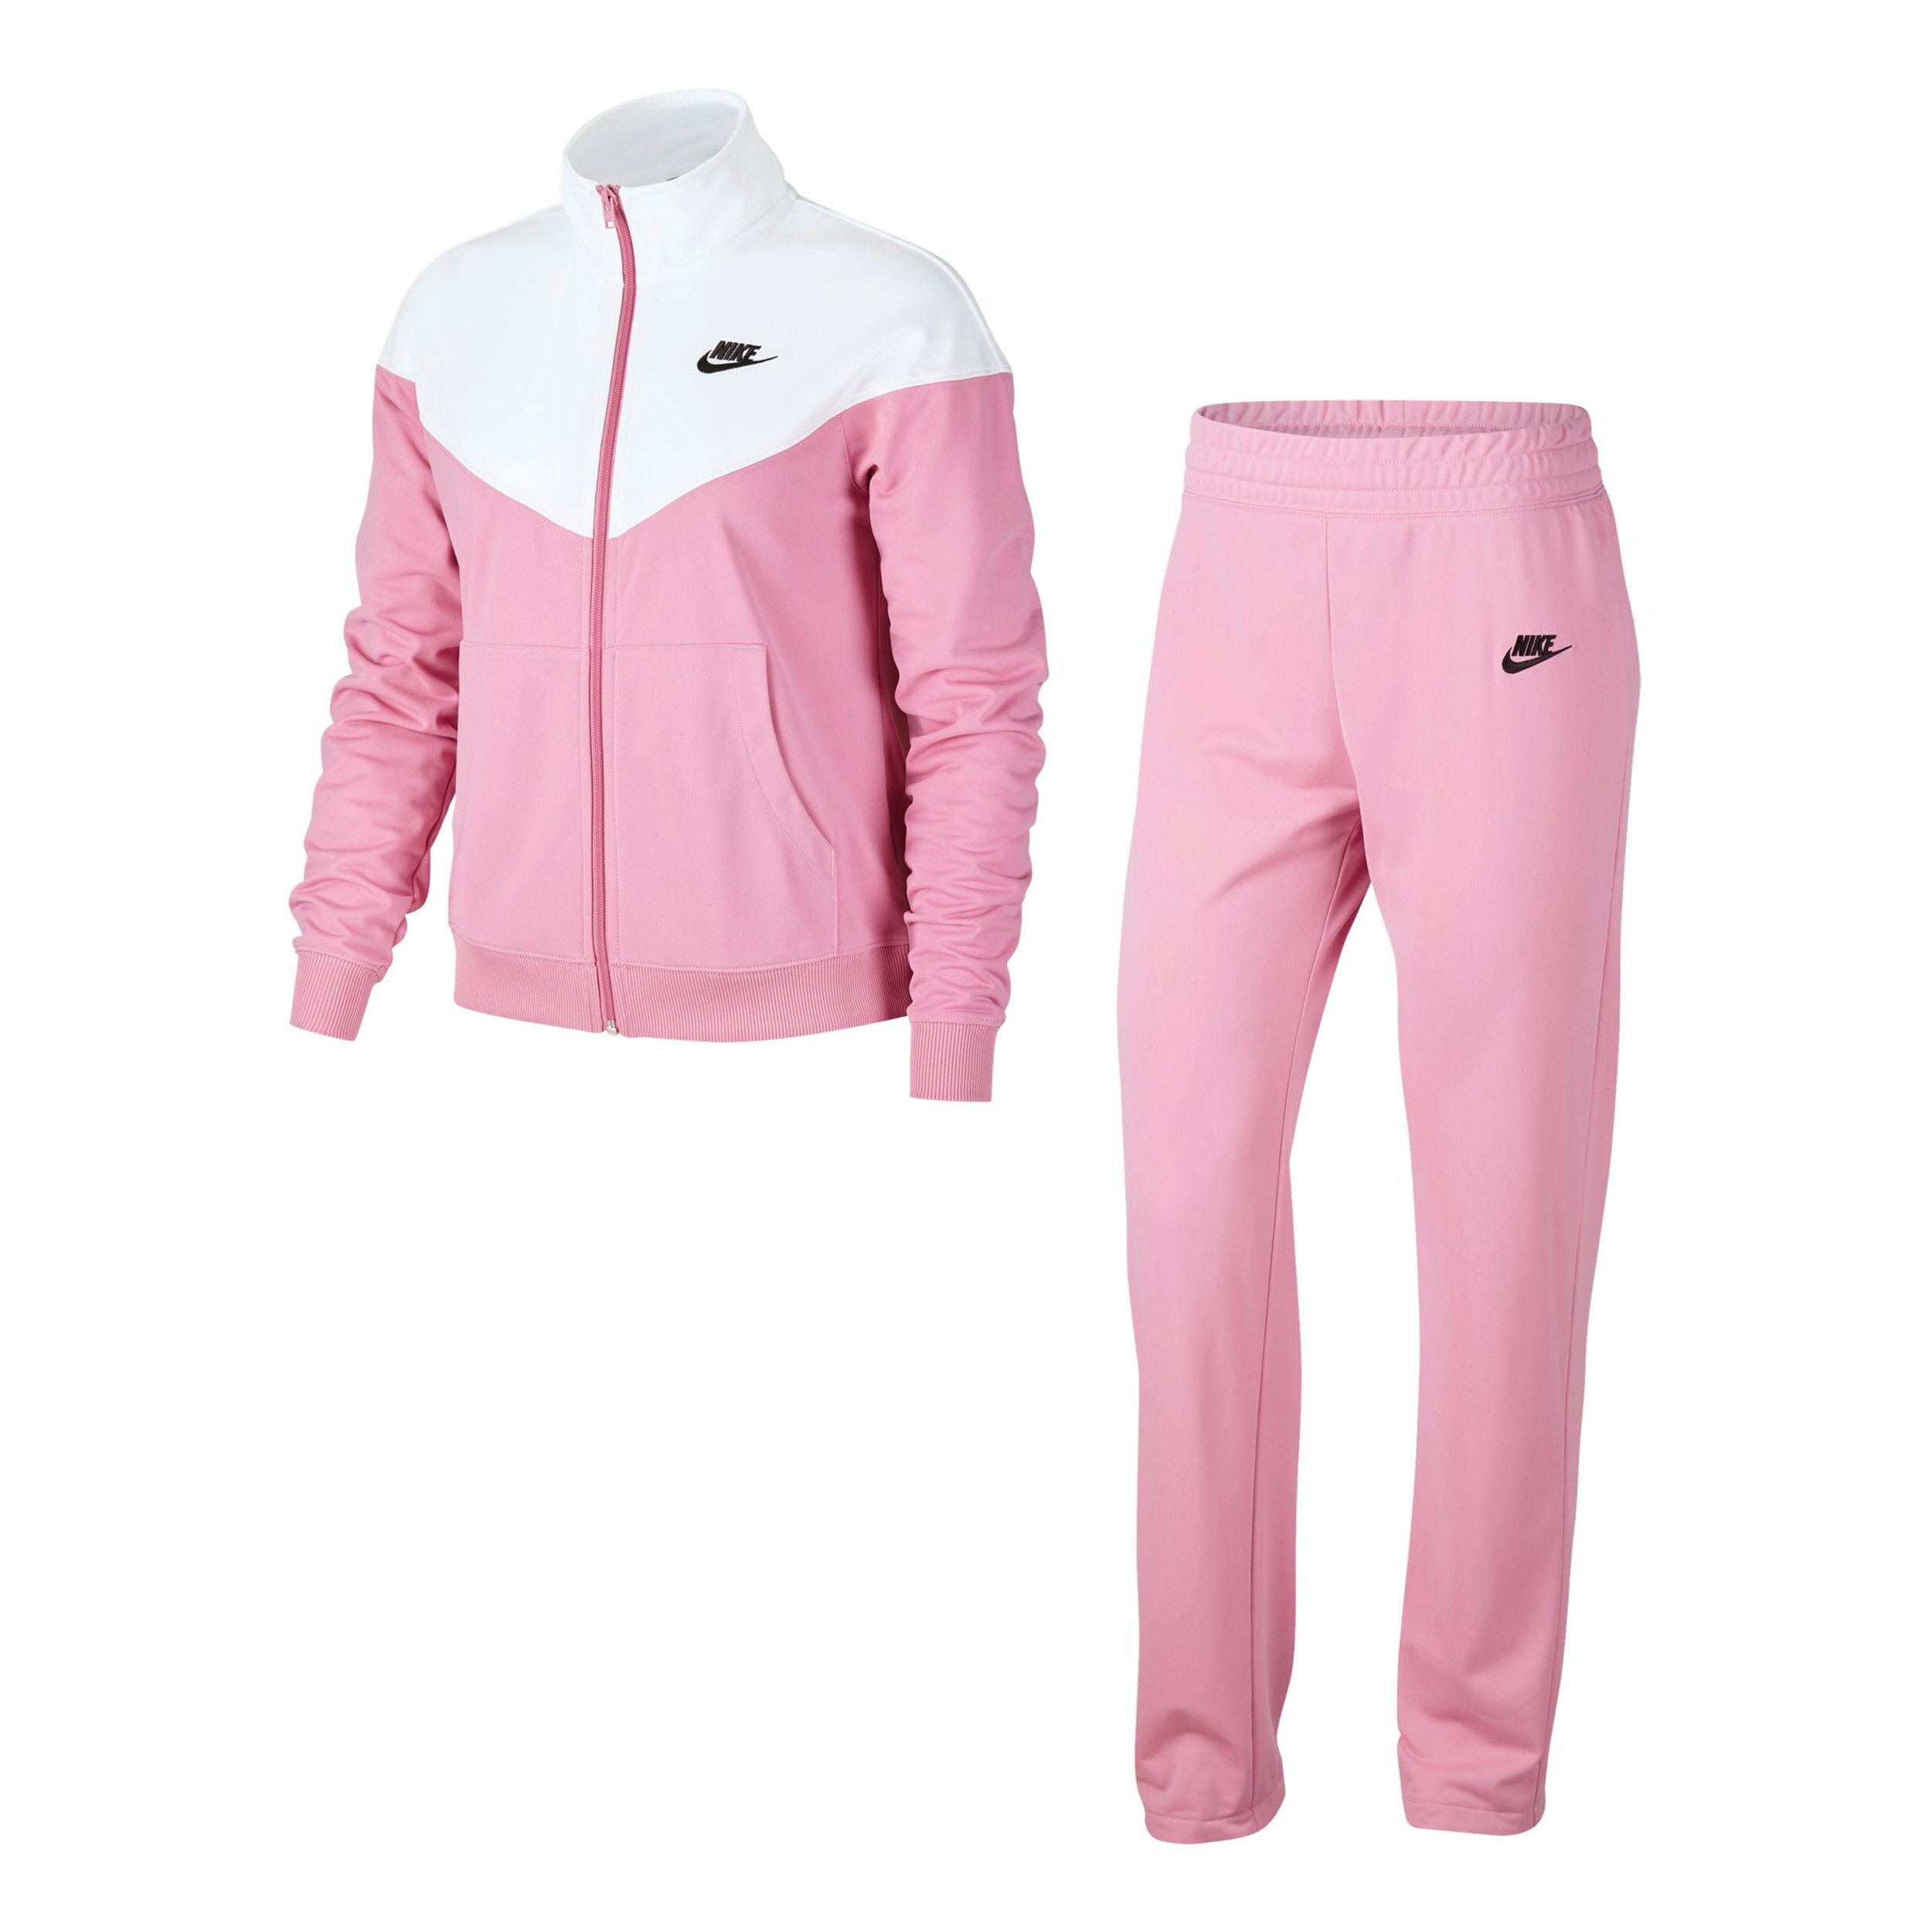 Nike Sportswear Trainingsanzug Damen Rosa, Weiß